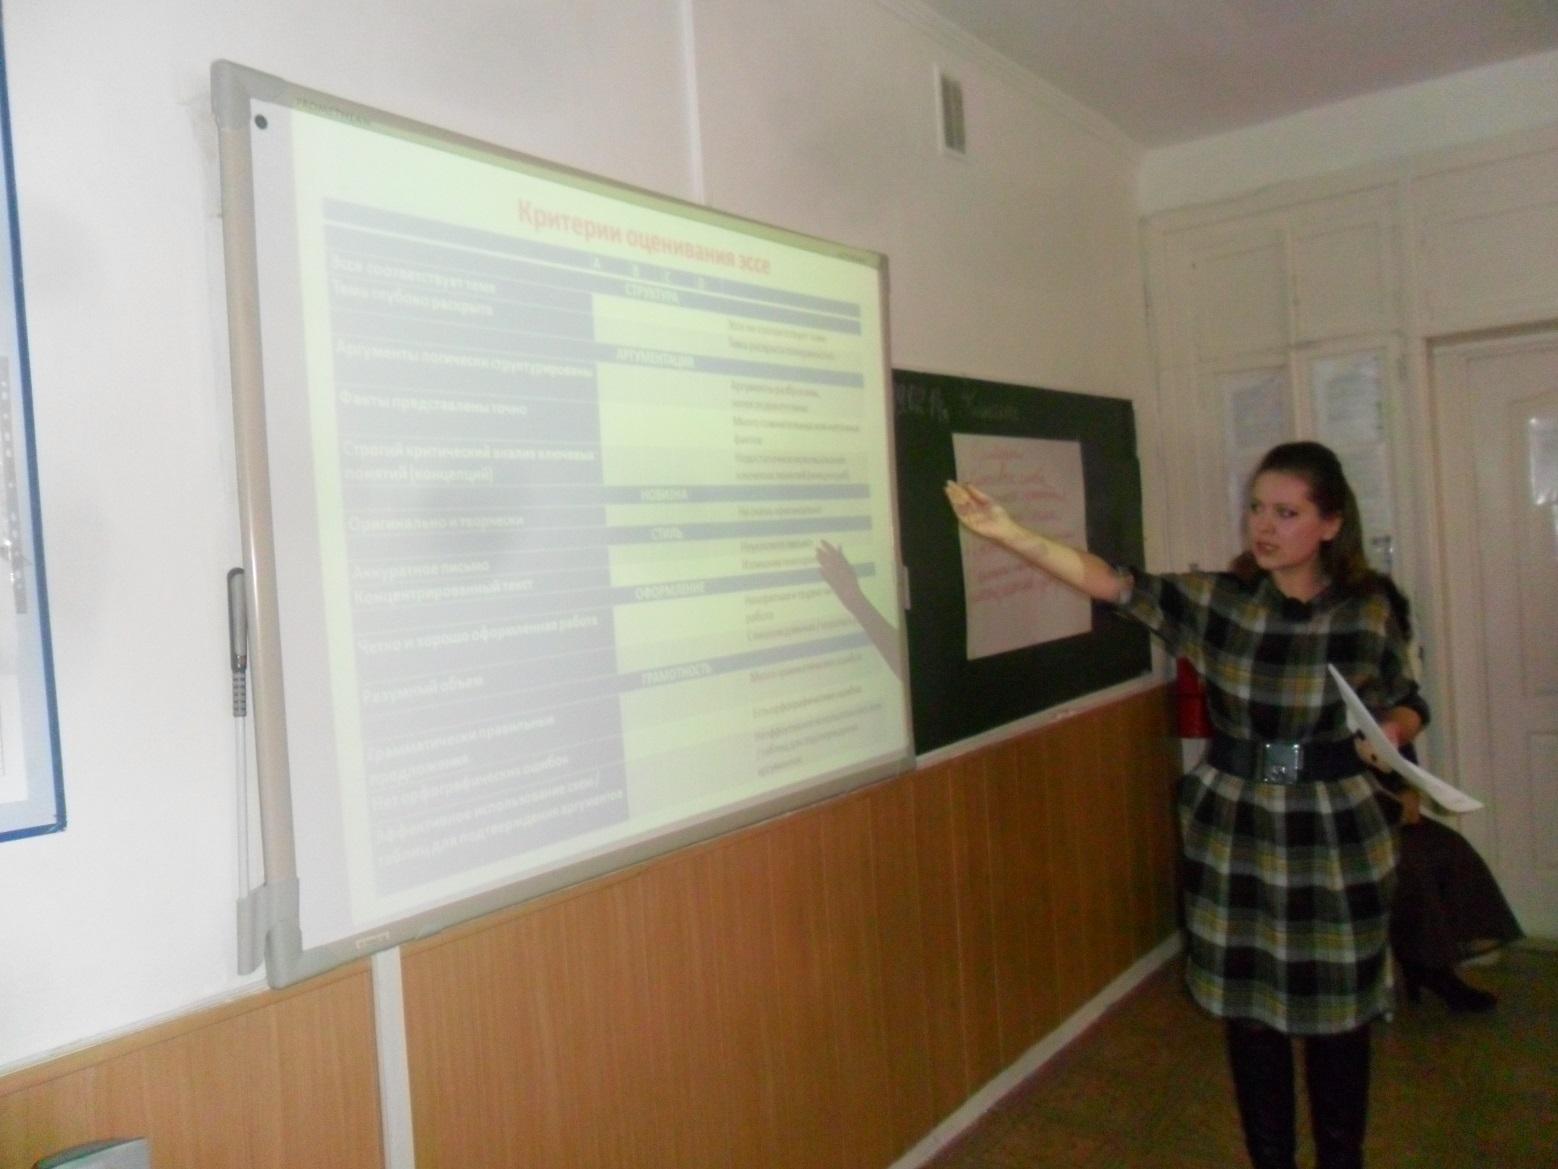 C:\Users\1\Desktop\семинар 19 февраля\cеминар\SAM_5773.JPG